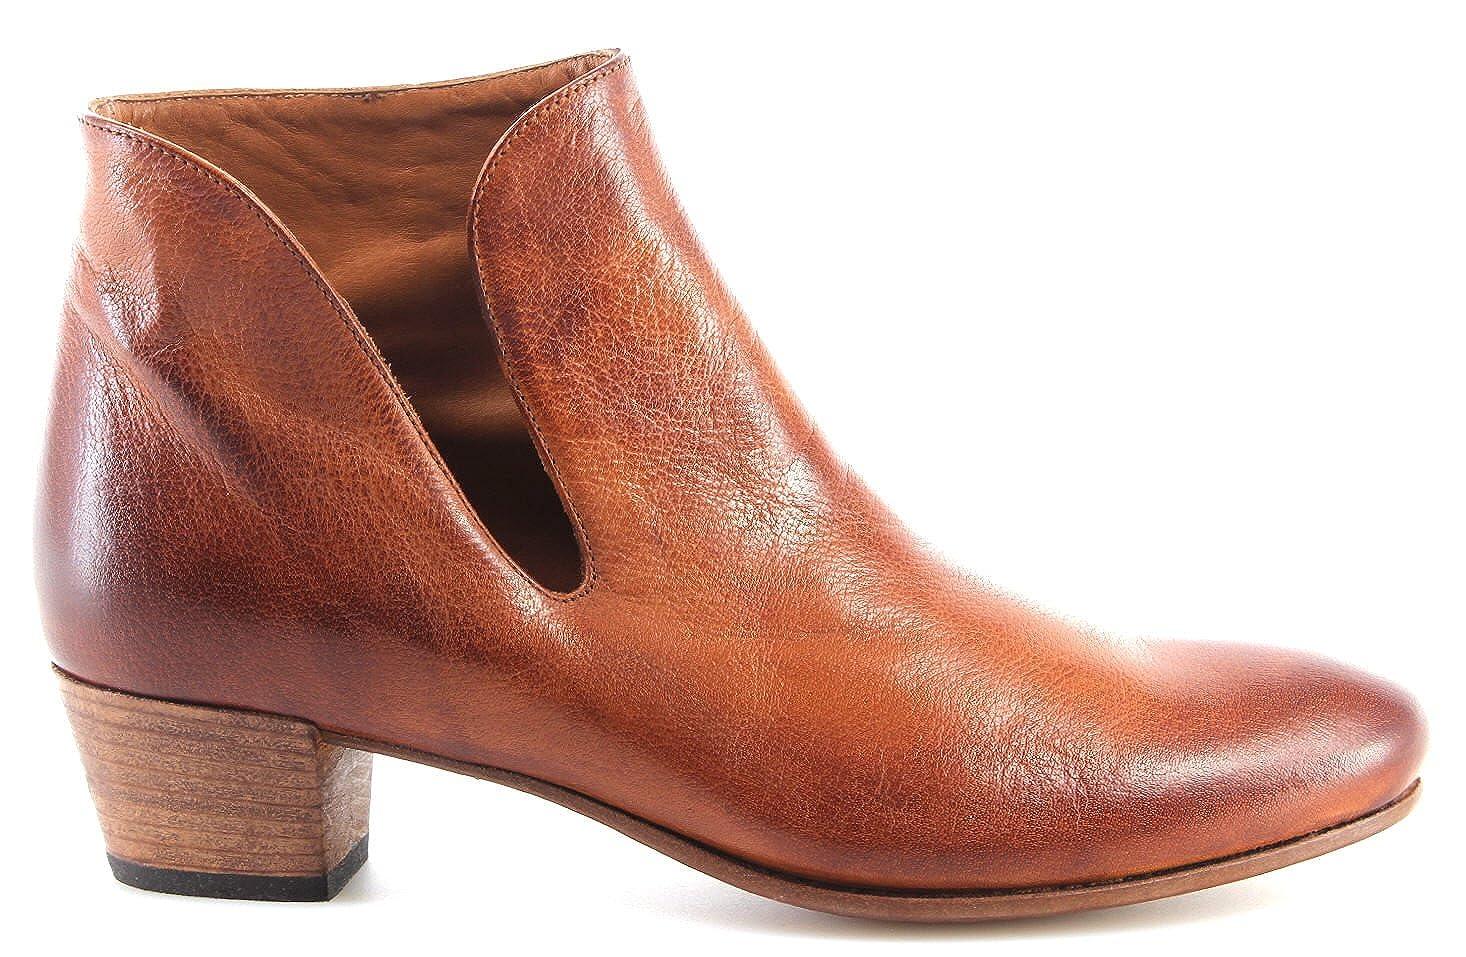 Femmes Brandy Chaussures Mexico Bottines PANTANETTI Turandot Kc1J3TlF